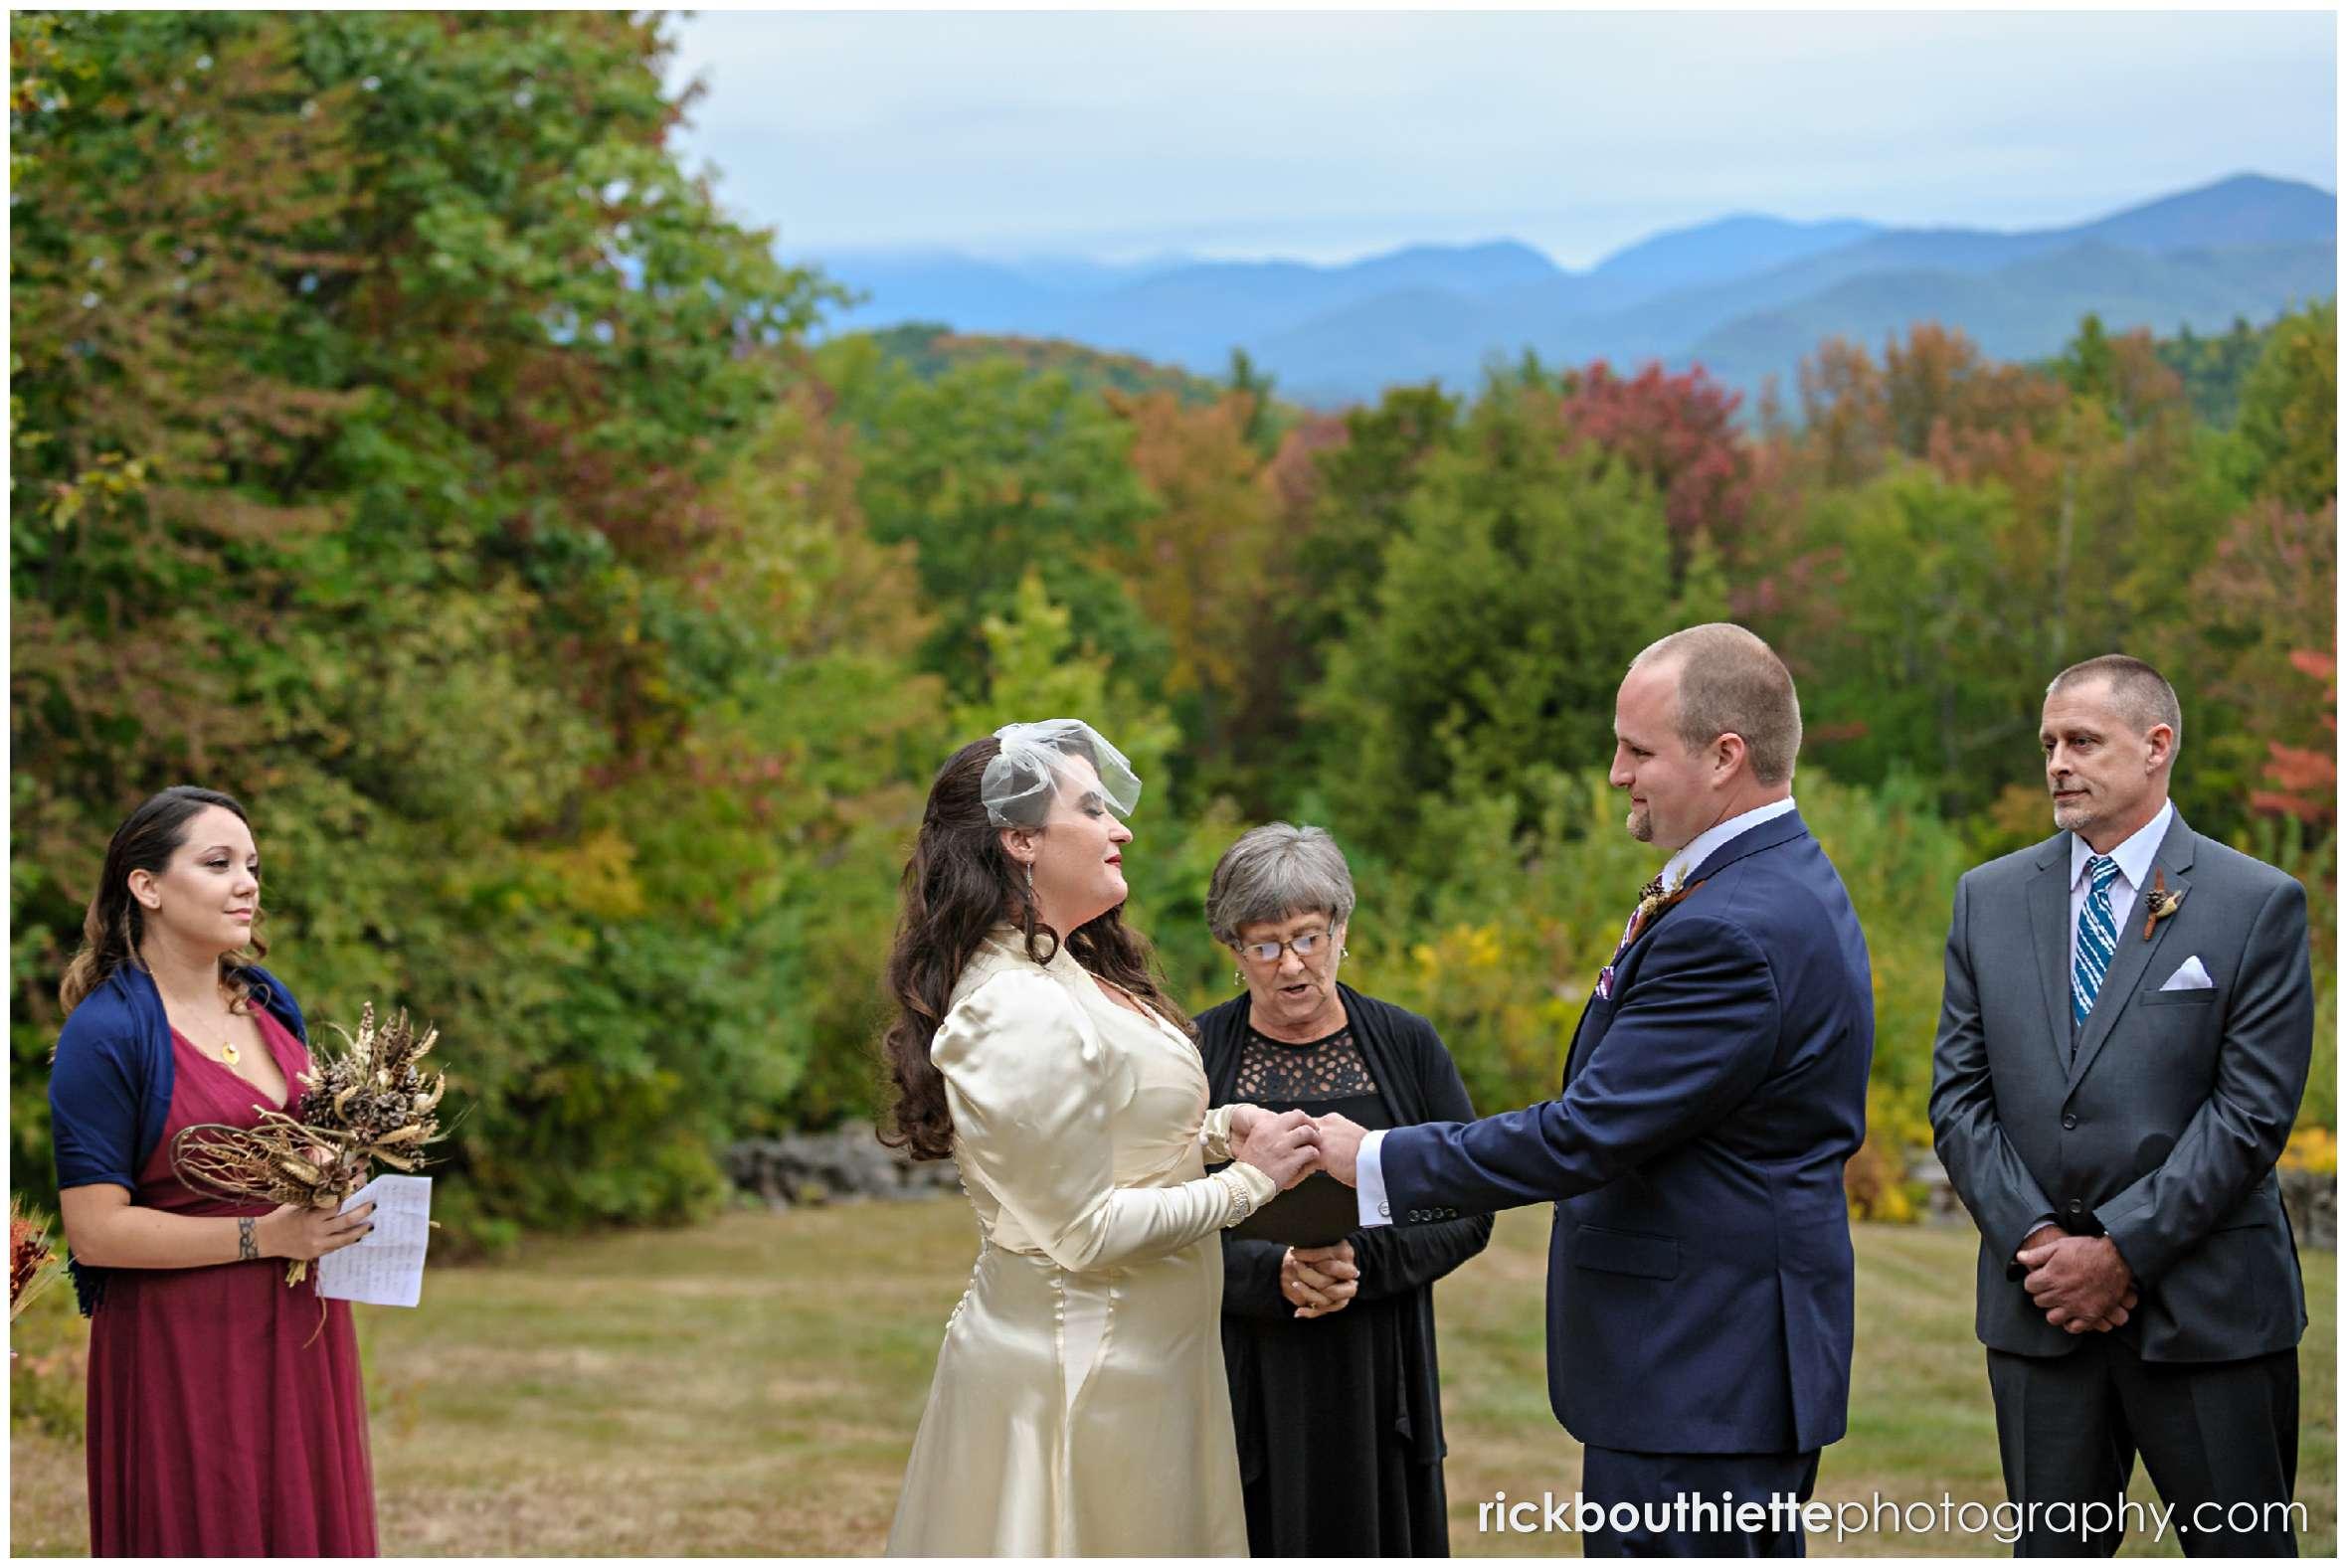 wedding ceremony at the Snowvillage Inn